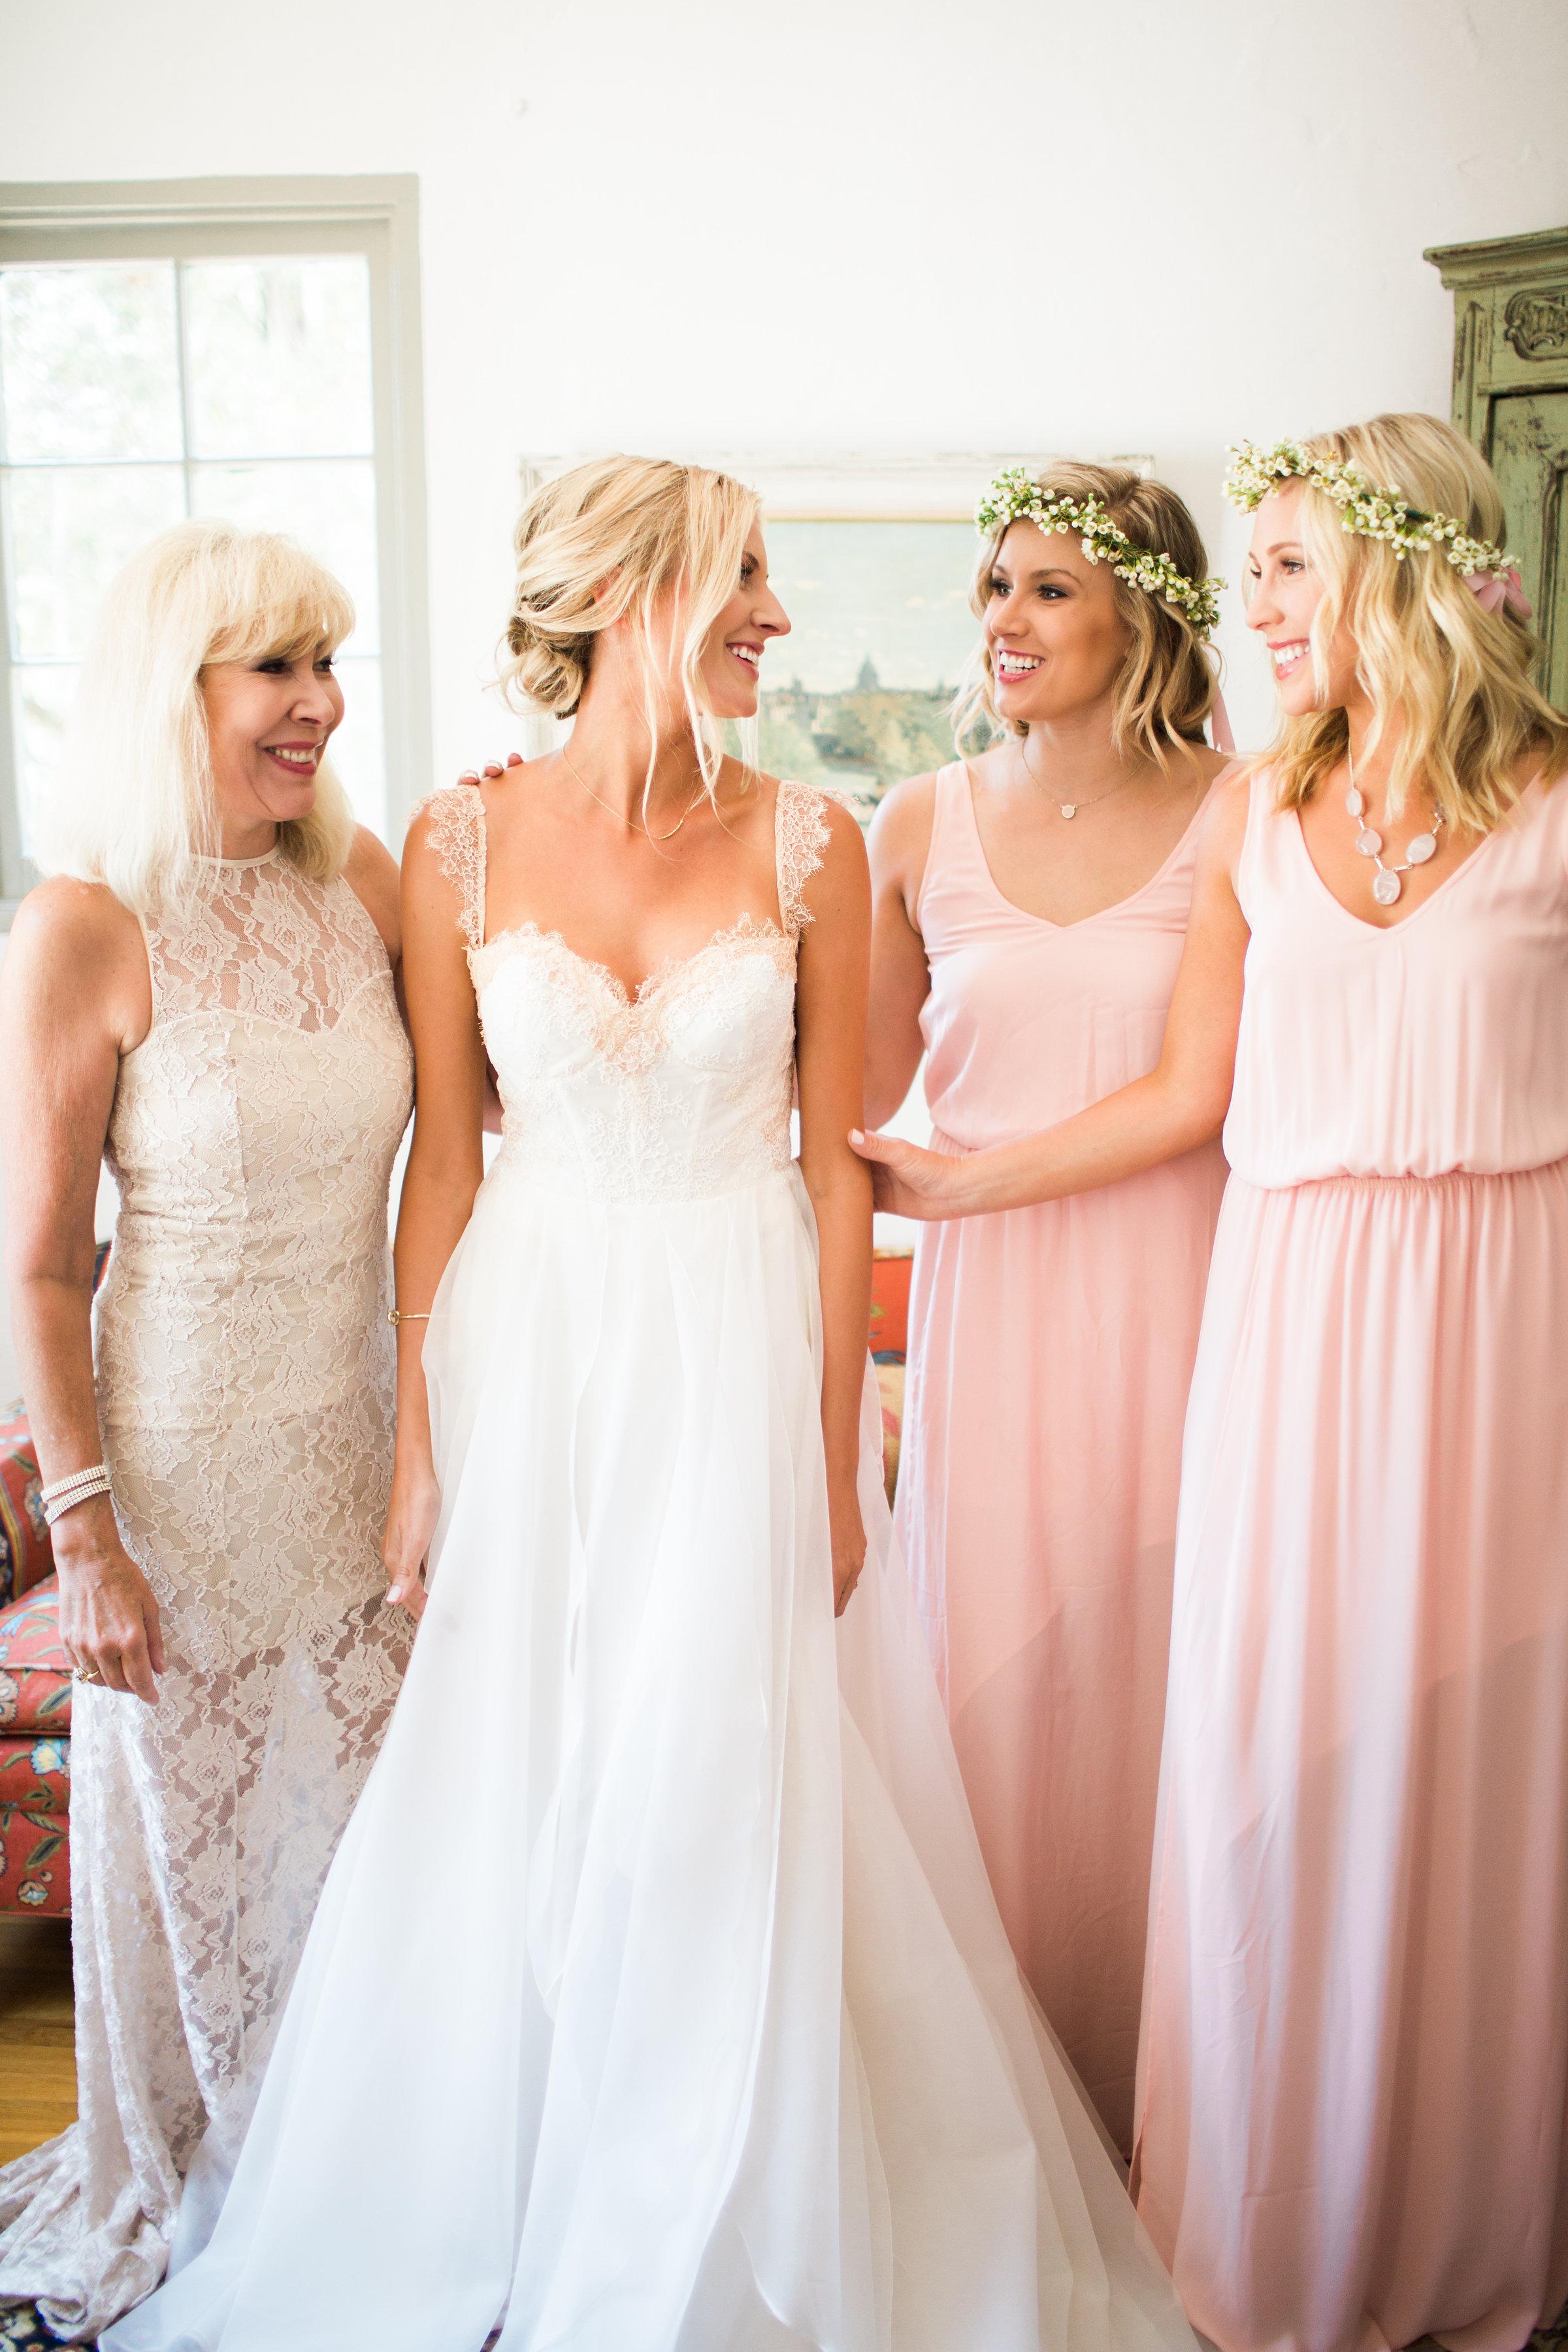 jess bridesmaids.jpg